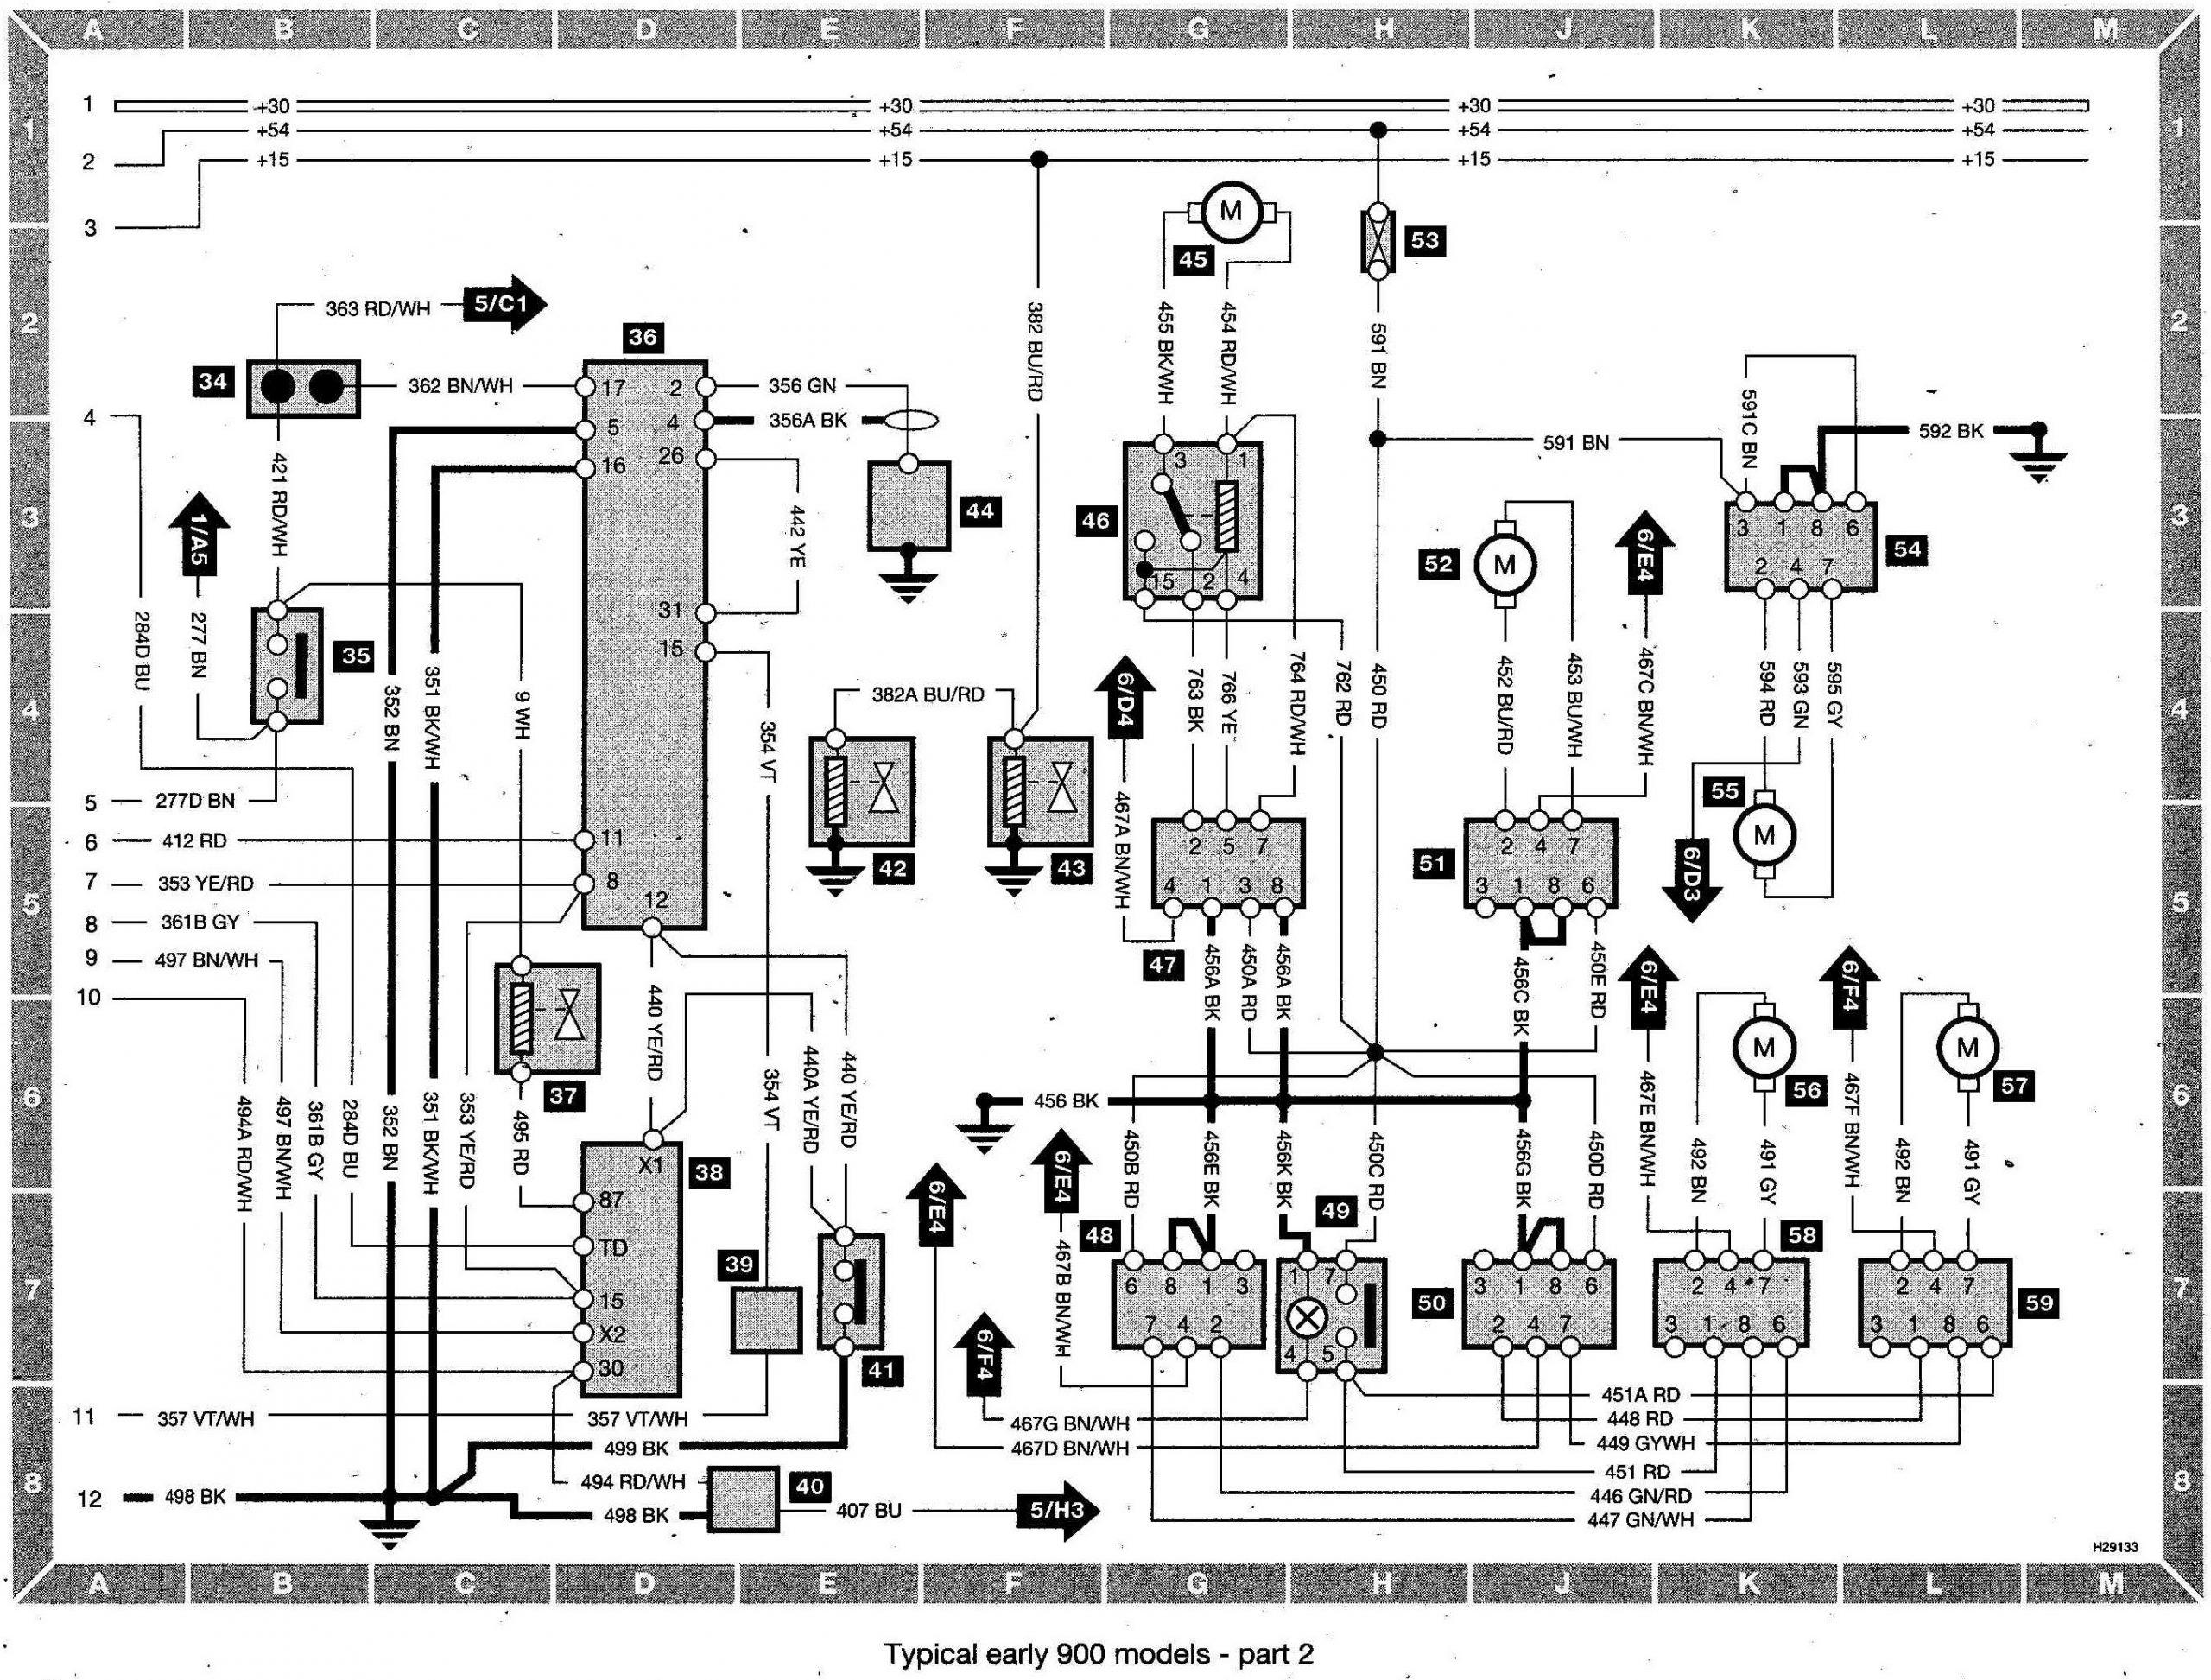 saab 9 3 mirror wiring diagram